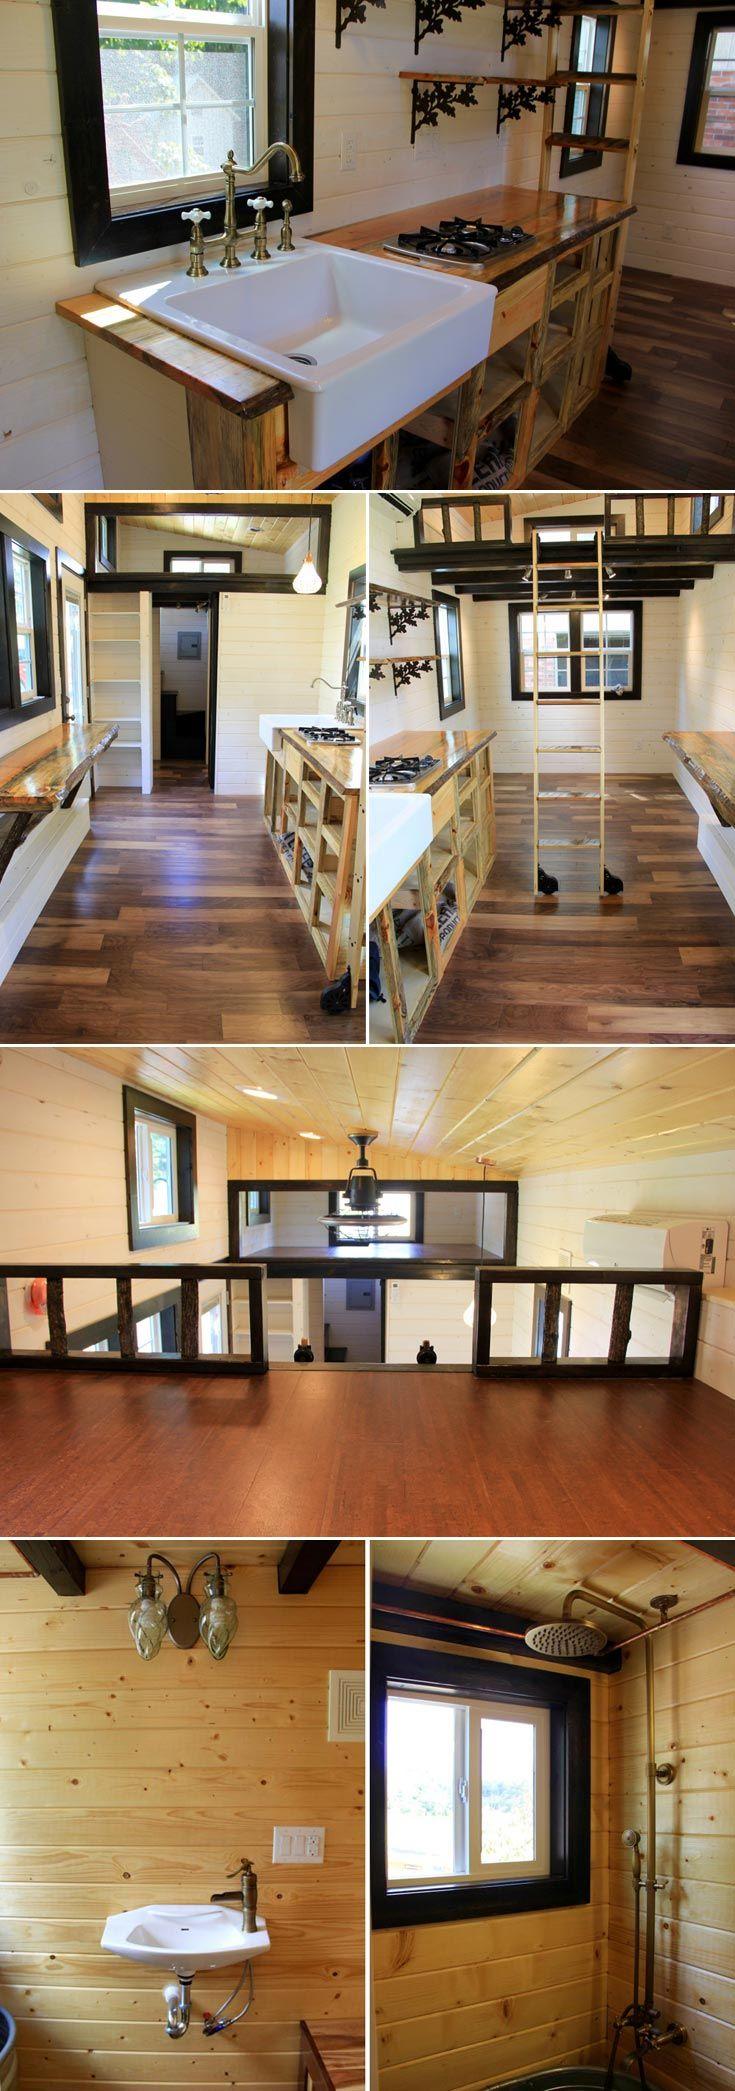 Tiny House Trailer Interior best 25+ house on wheels ideas on pinterest | tiny house on wheels